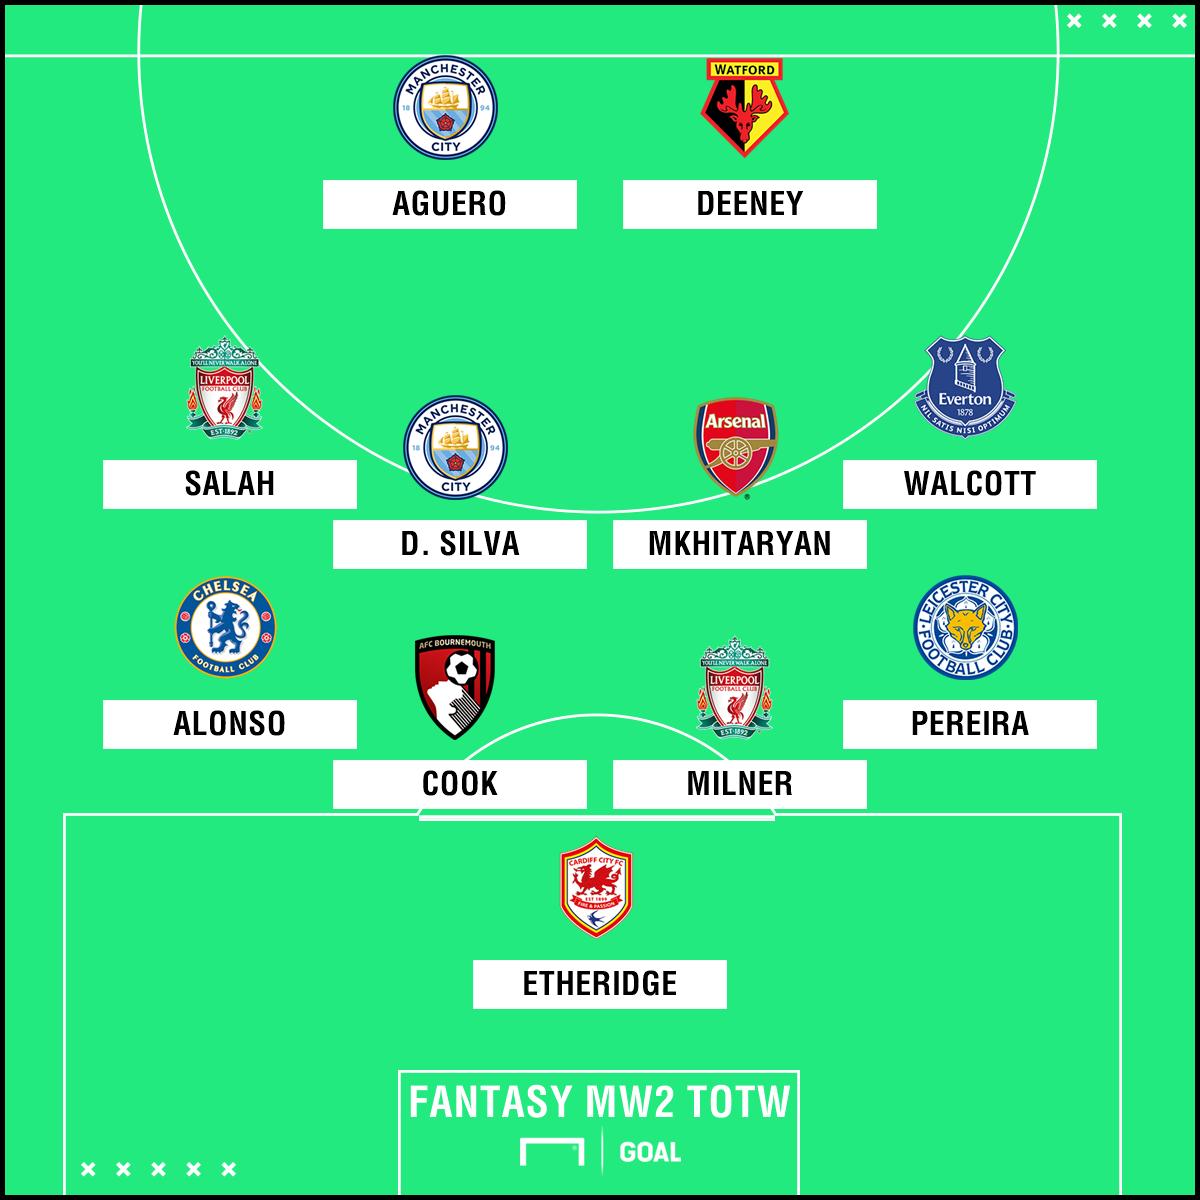 Fantasy team of the week matchweek 2